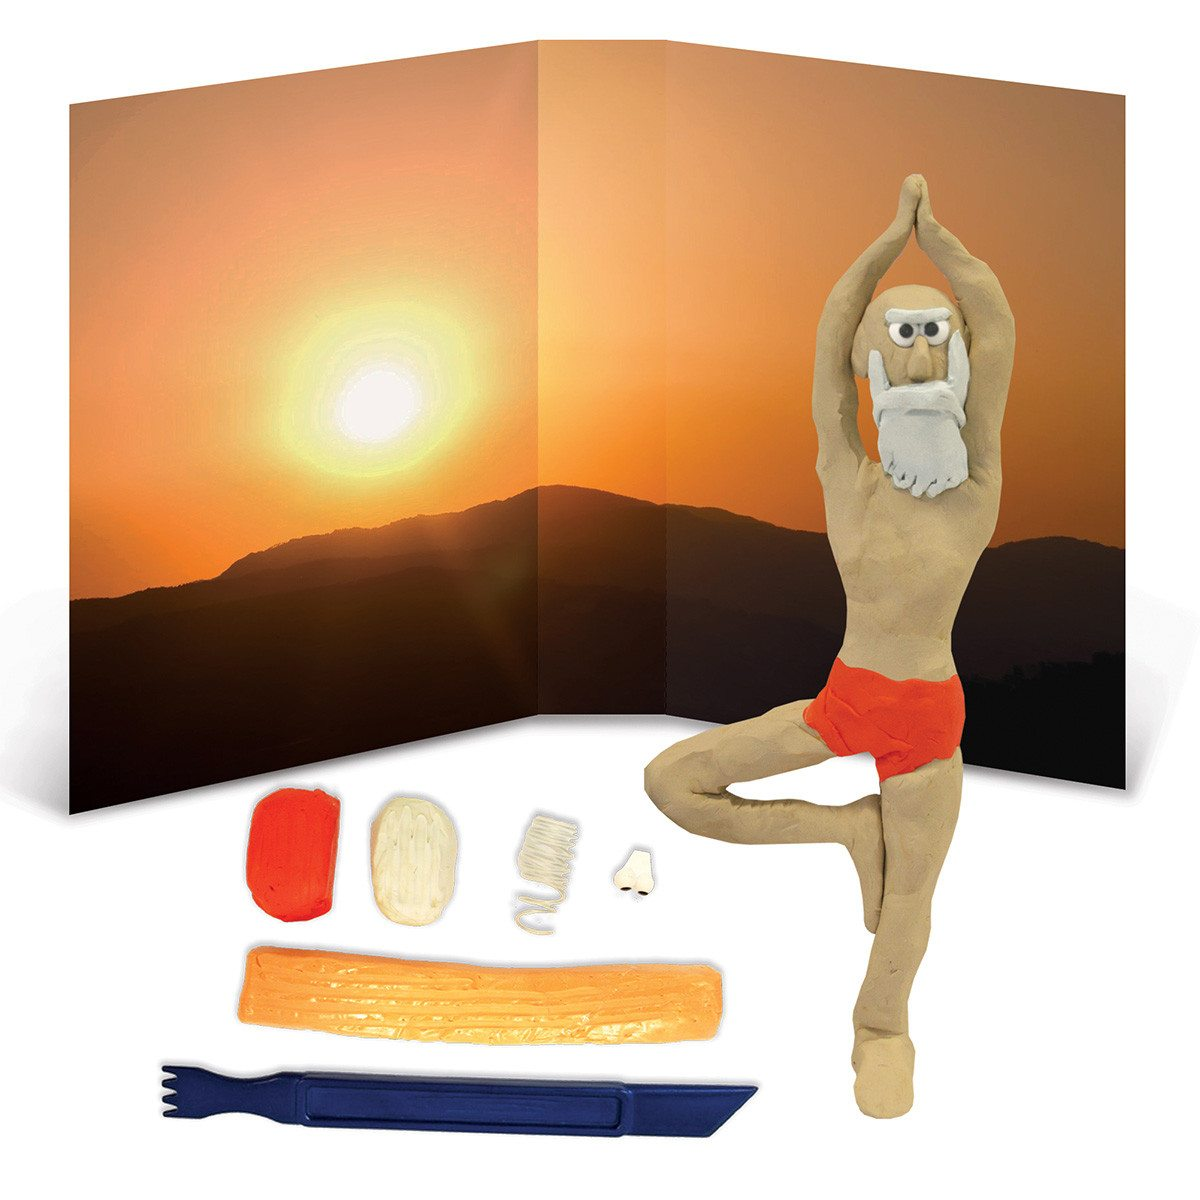 Form din egen yogi